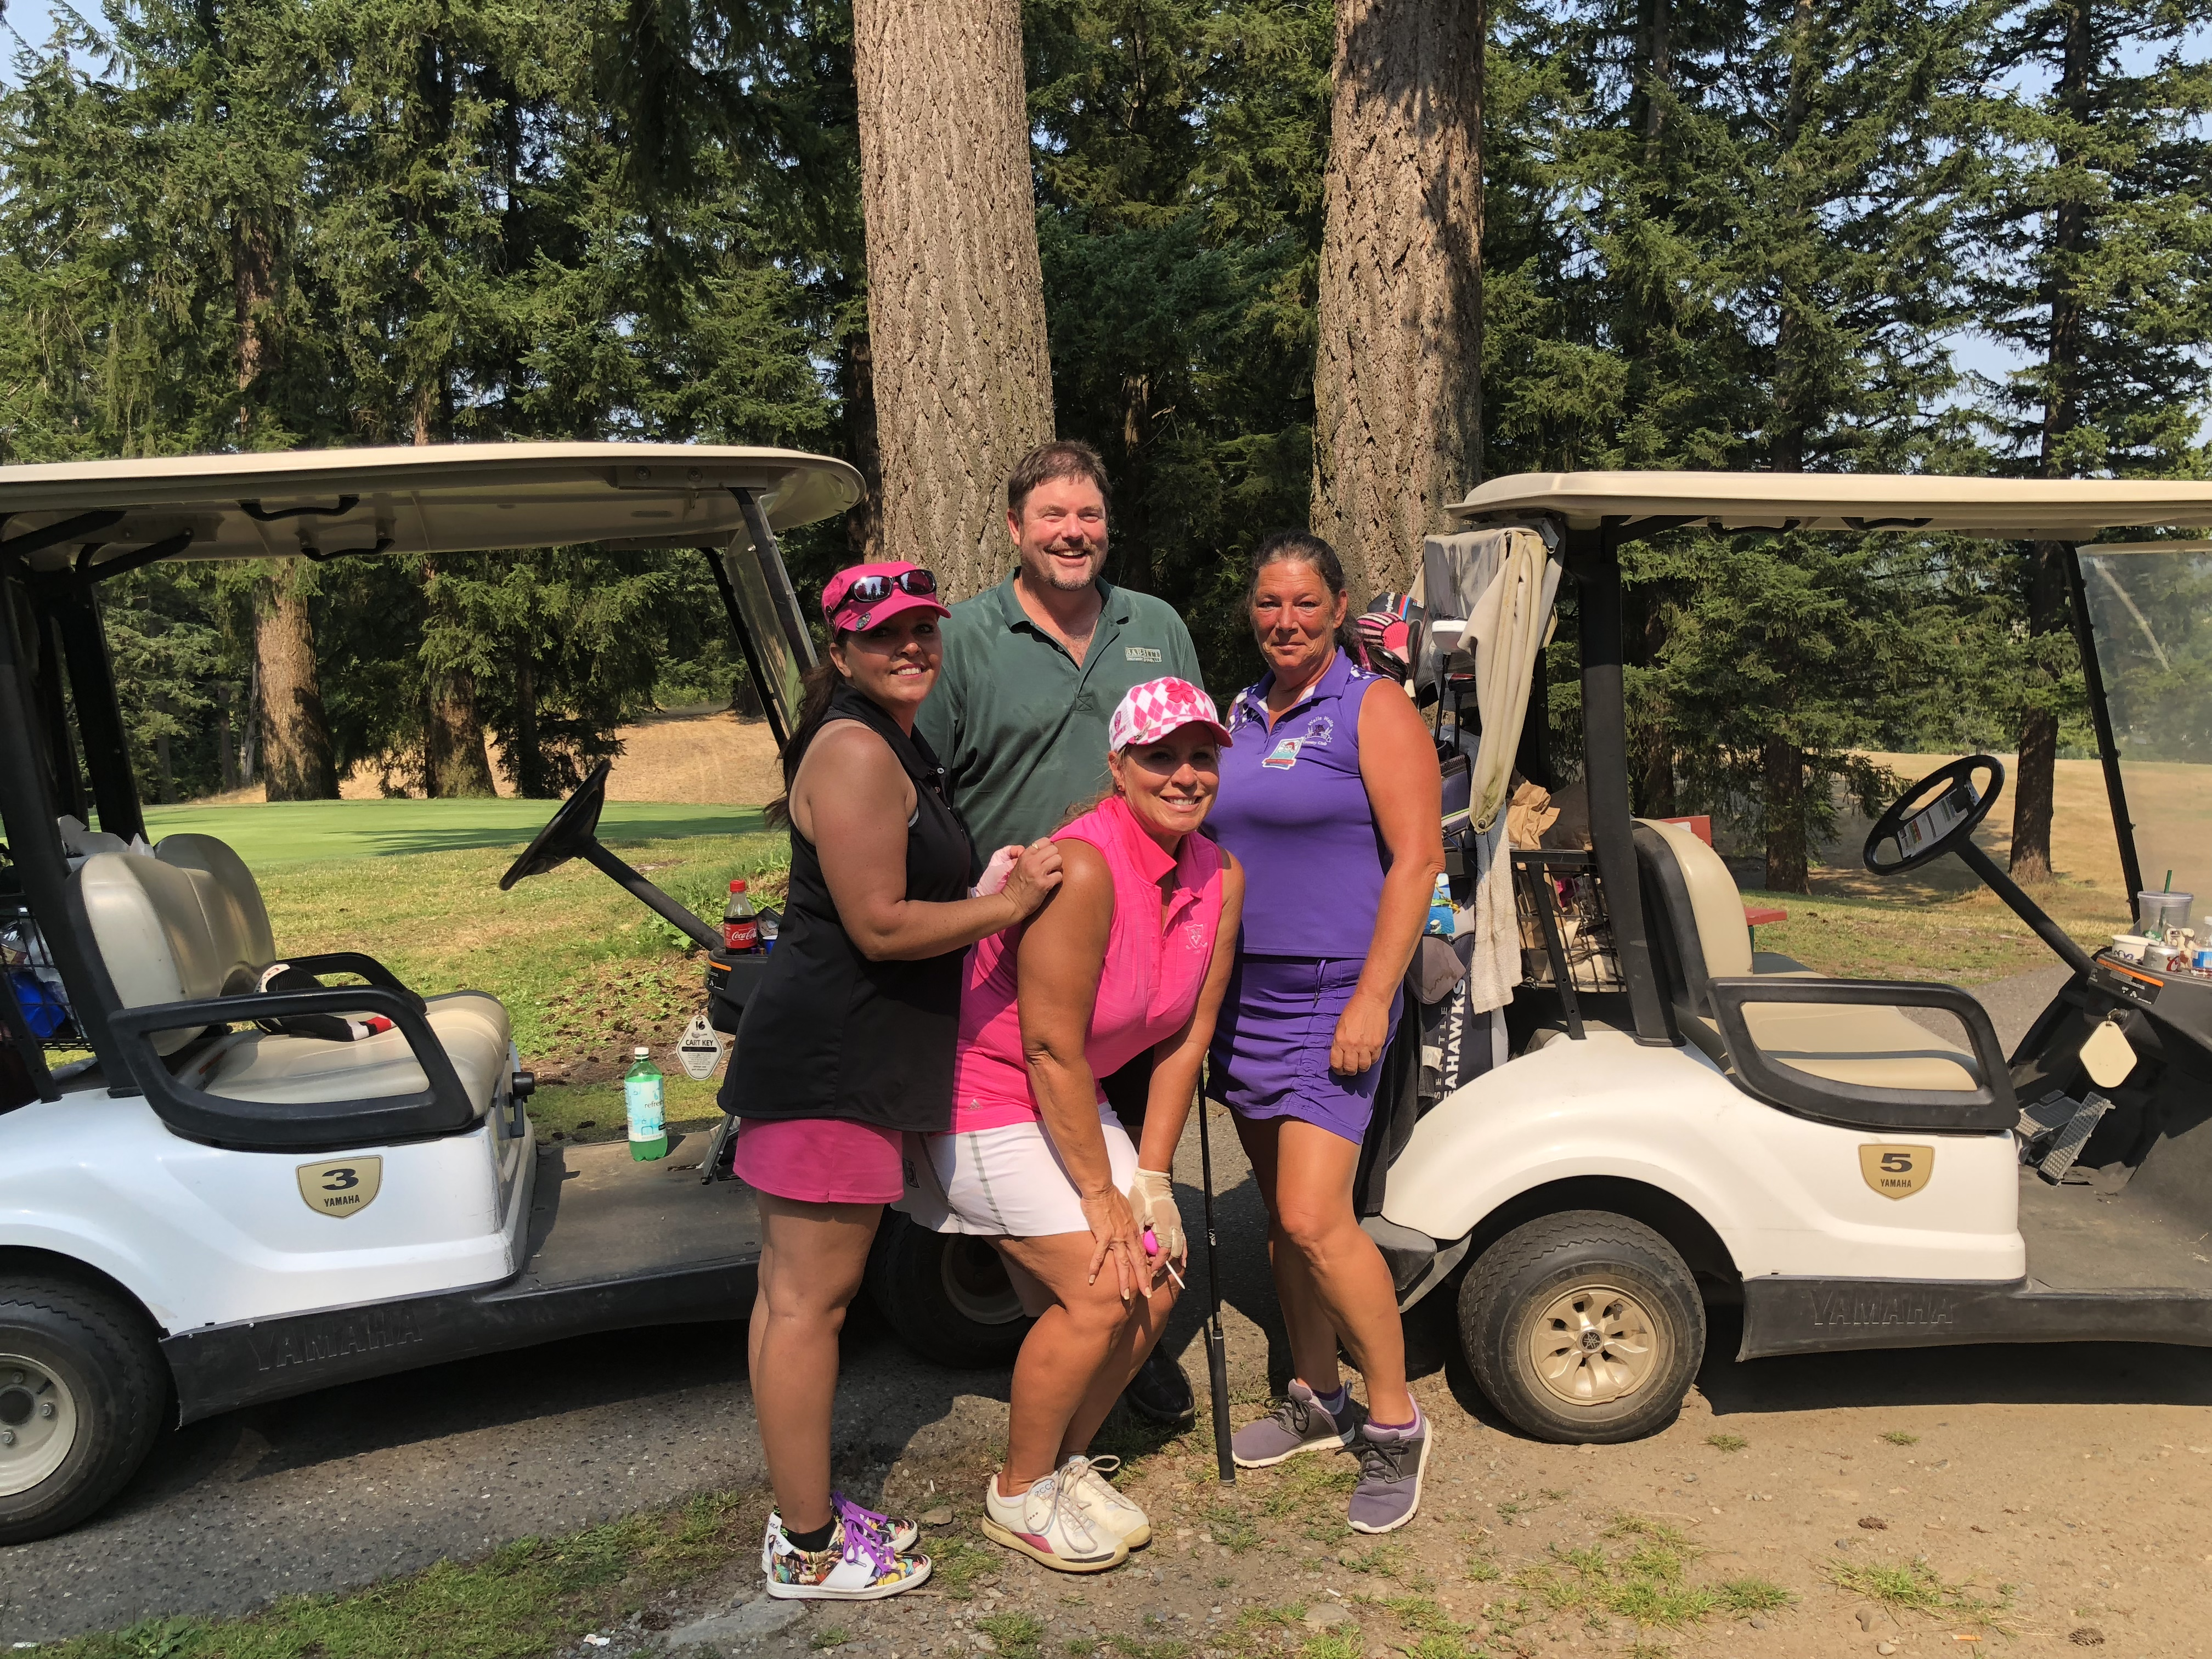 Group of women golfers